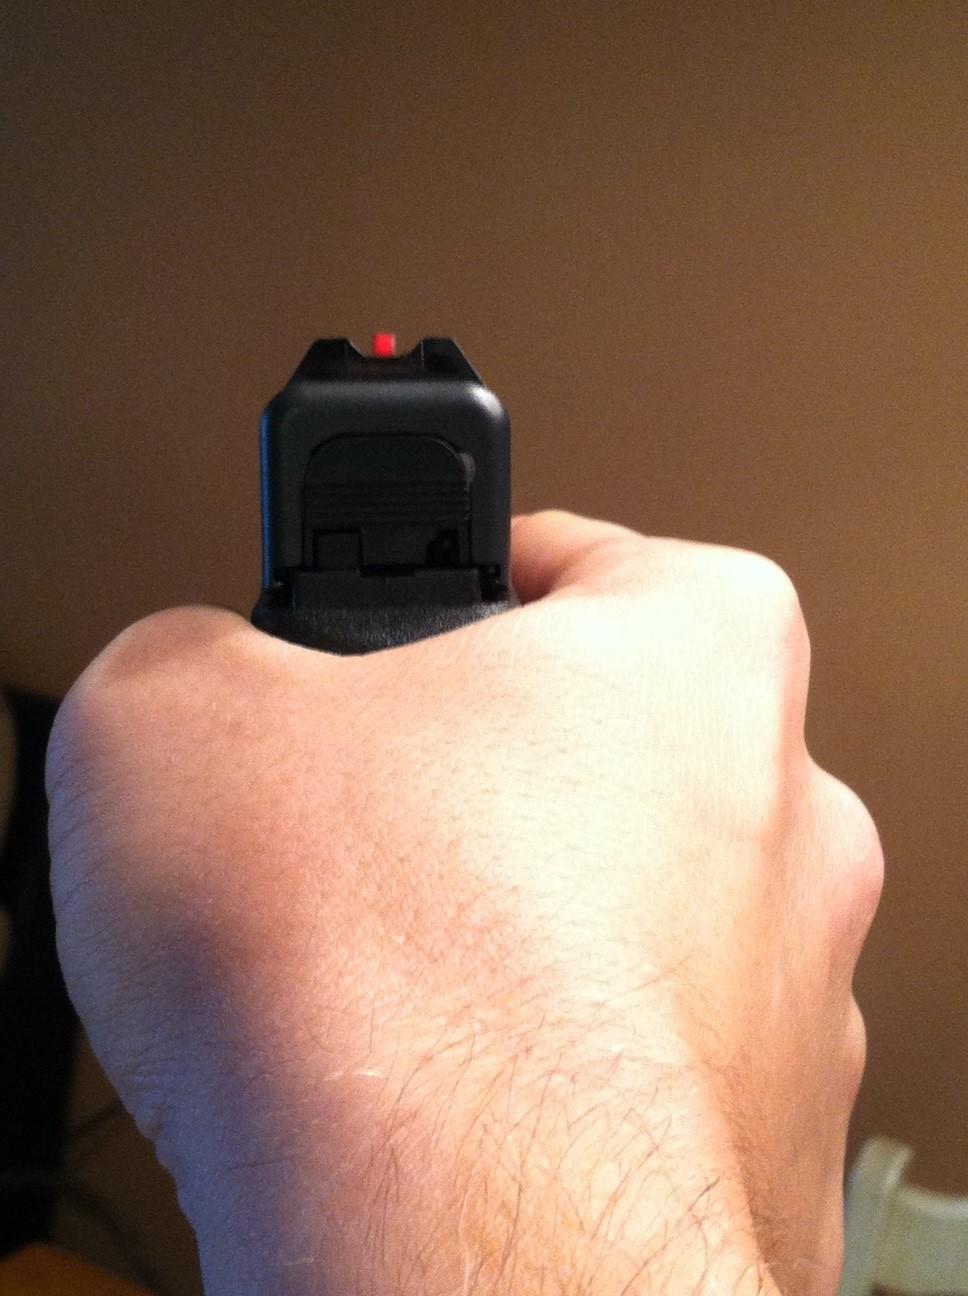 My home made Glock Sight-glocksight3.jpg